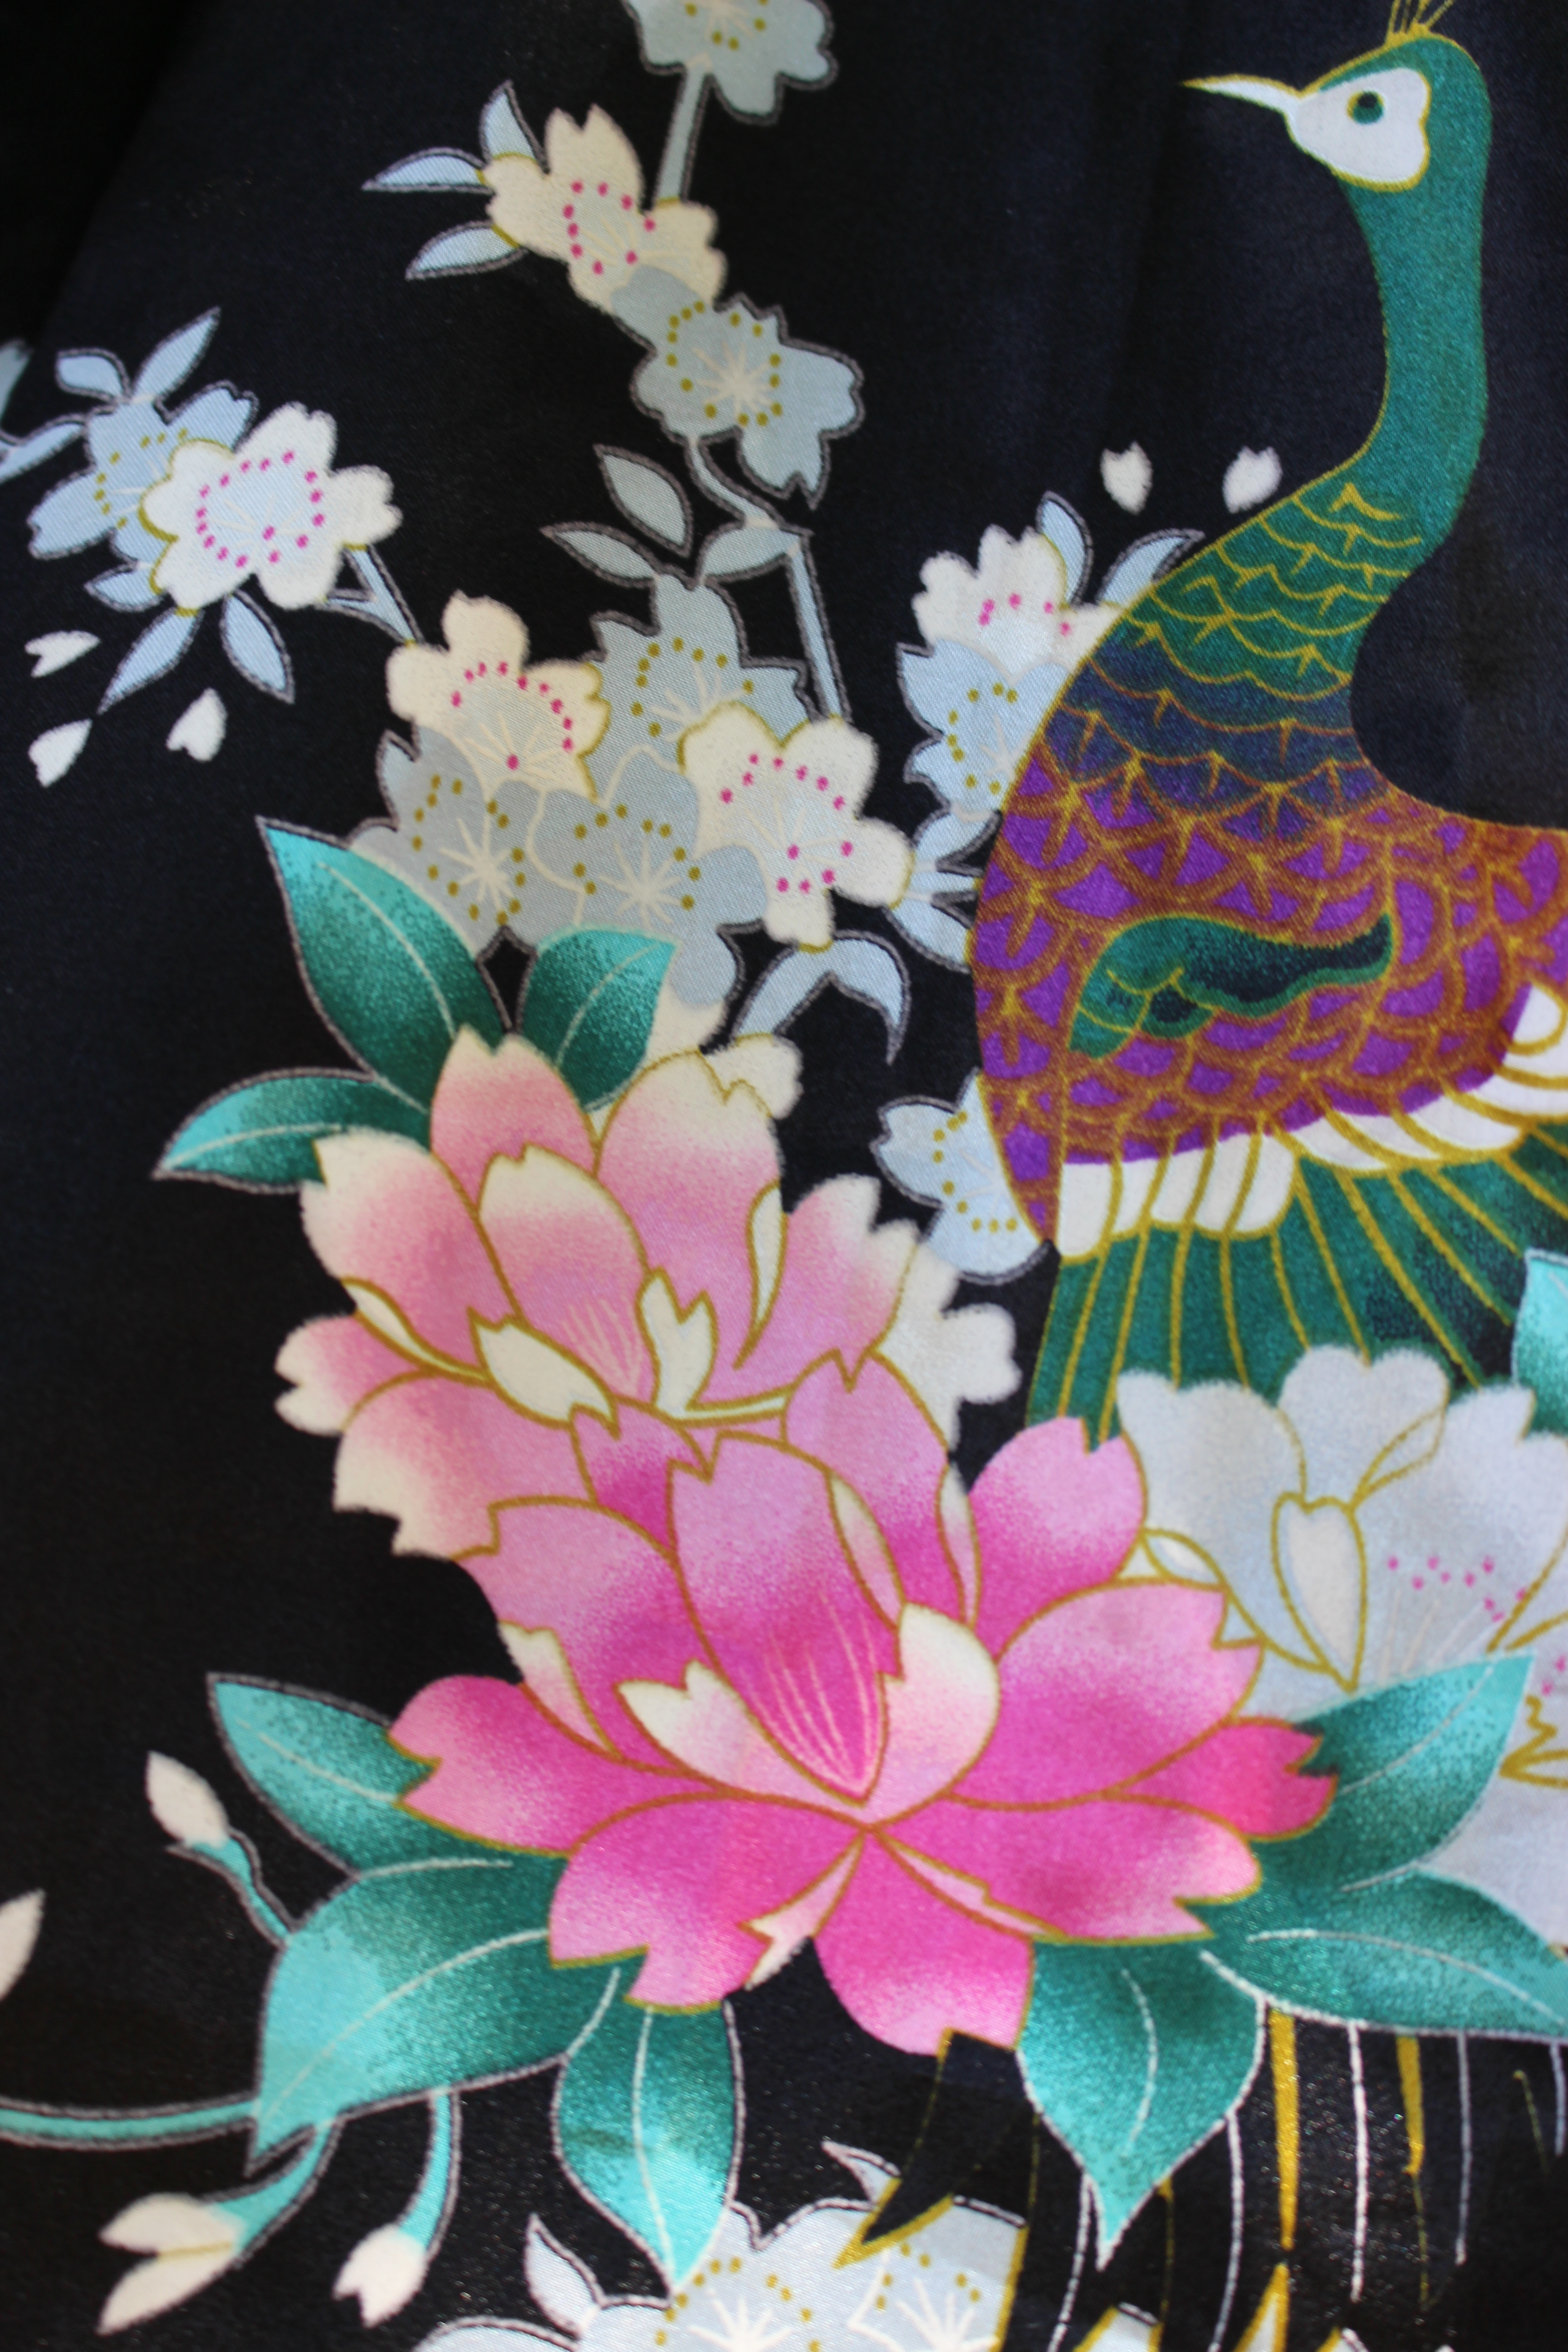 TianBaoGong peacock kimono, showing pattern